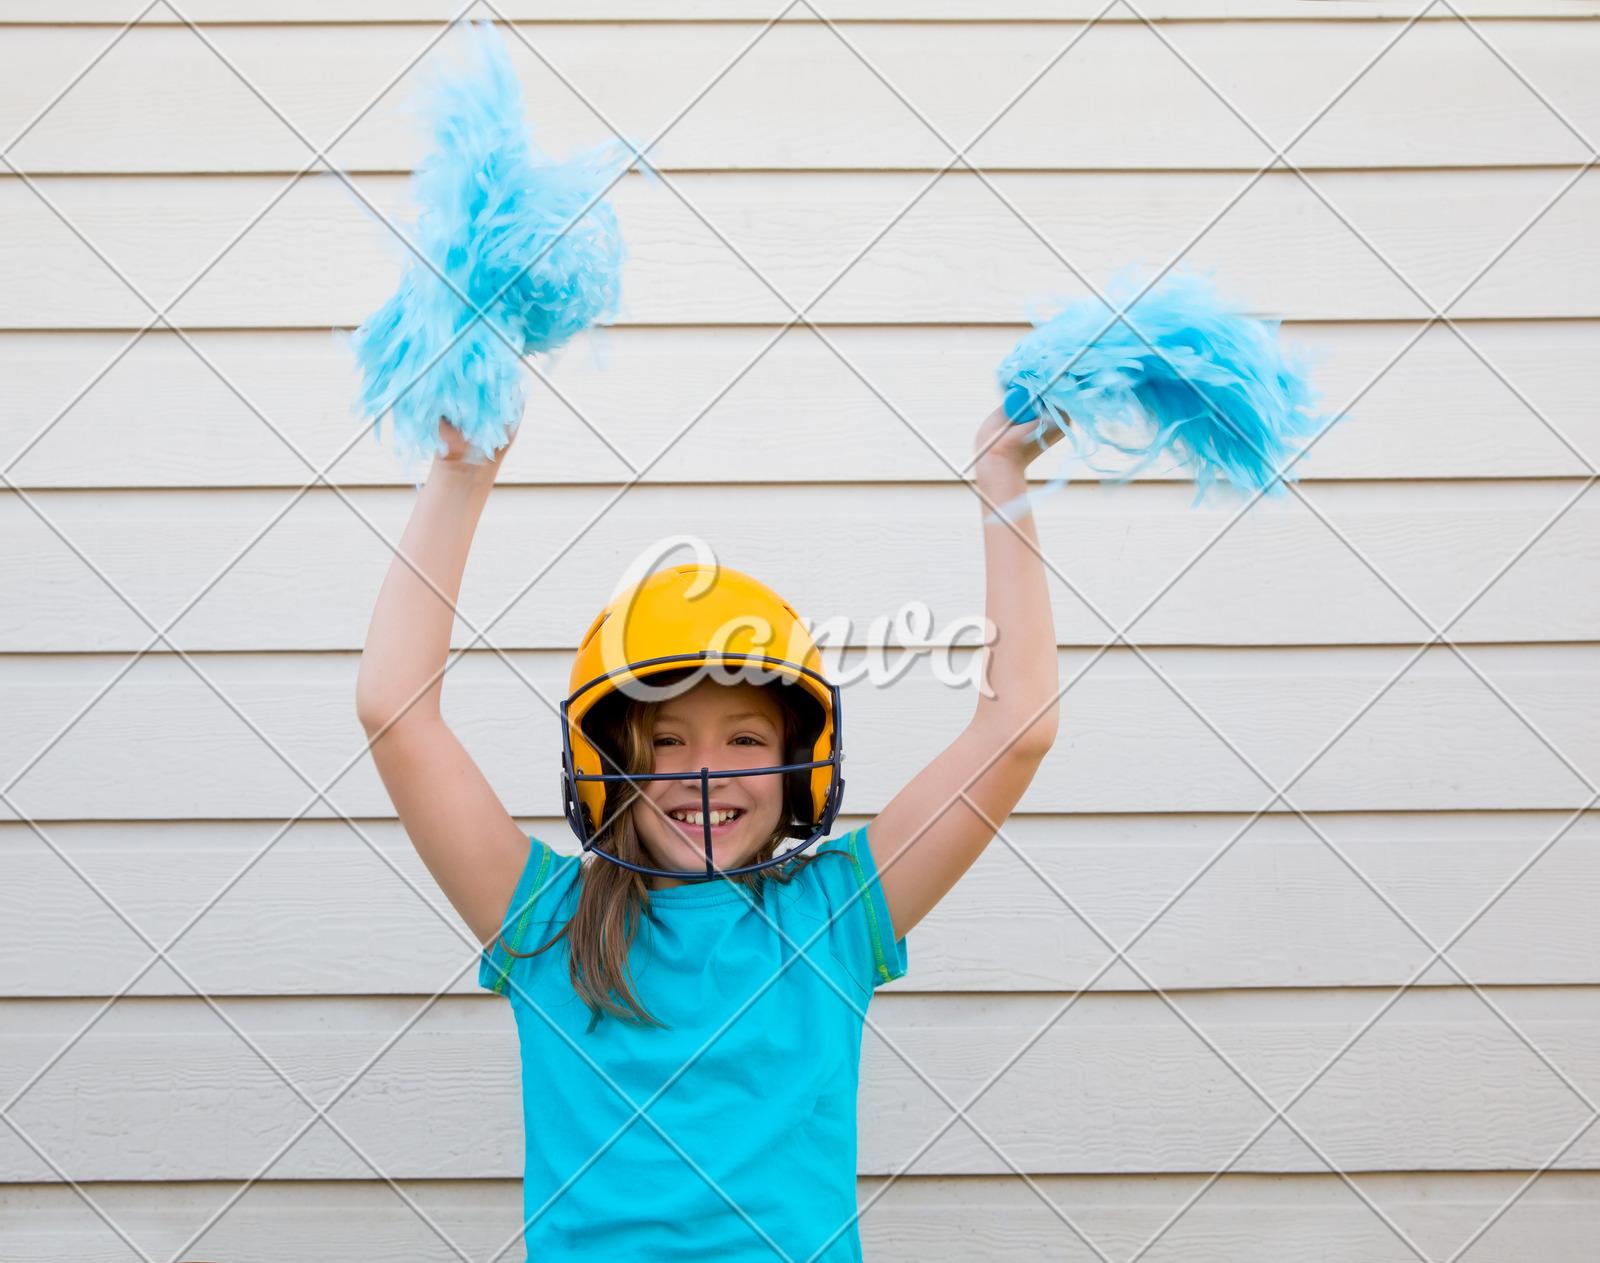 Baseball Cheerleading Pom Poms Girl Happy Smiling